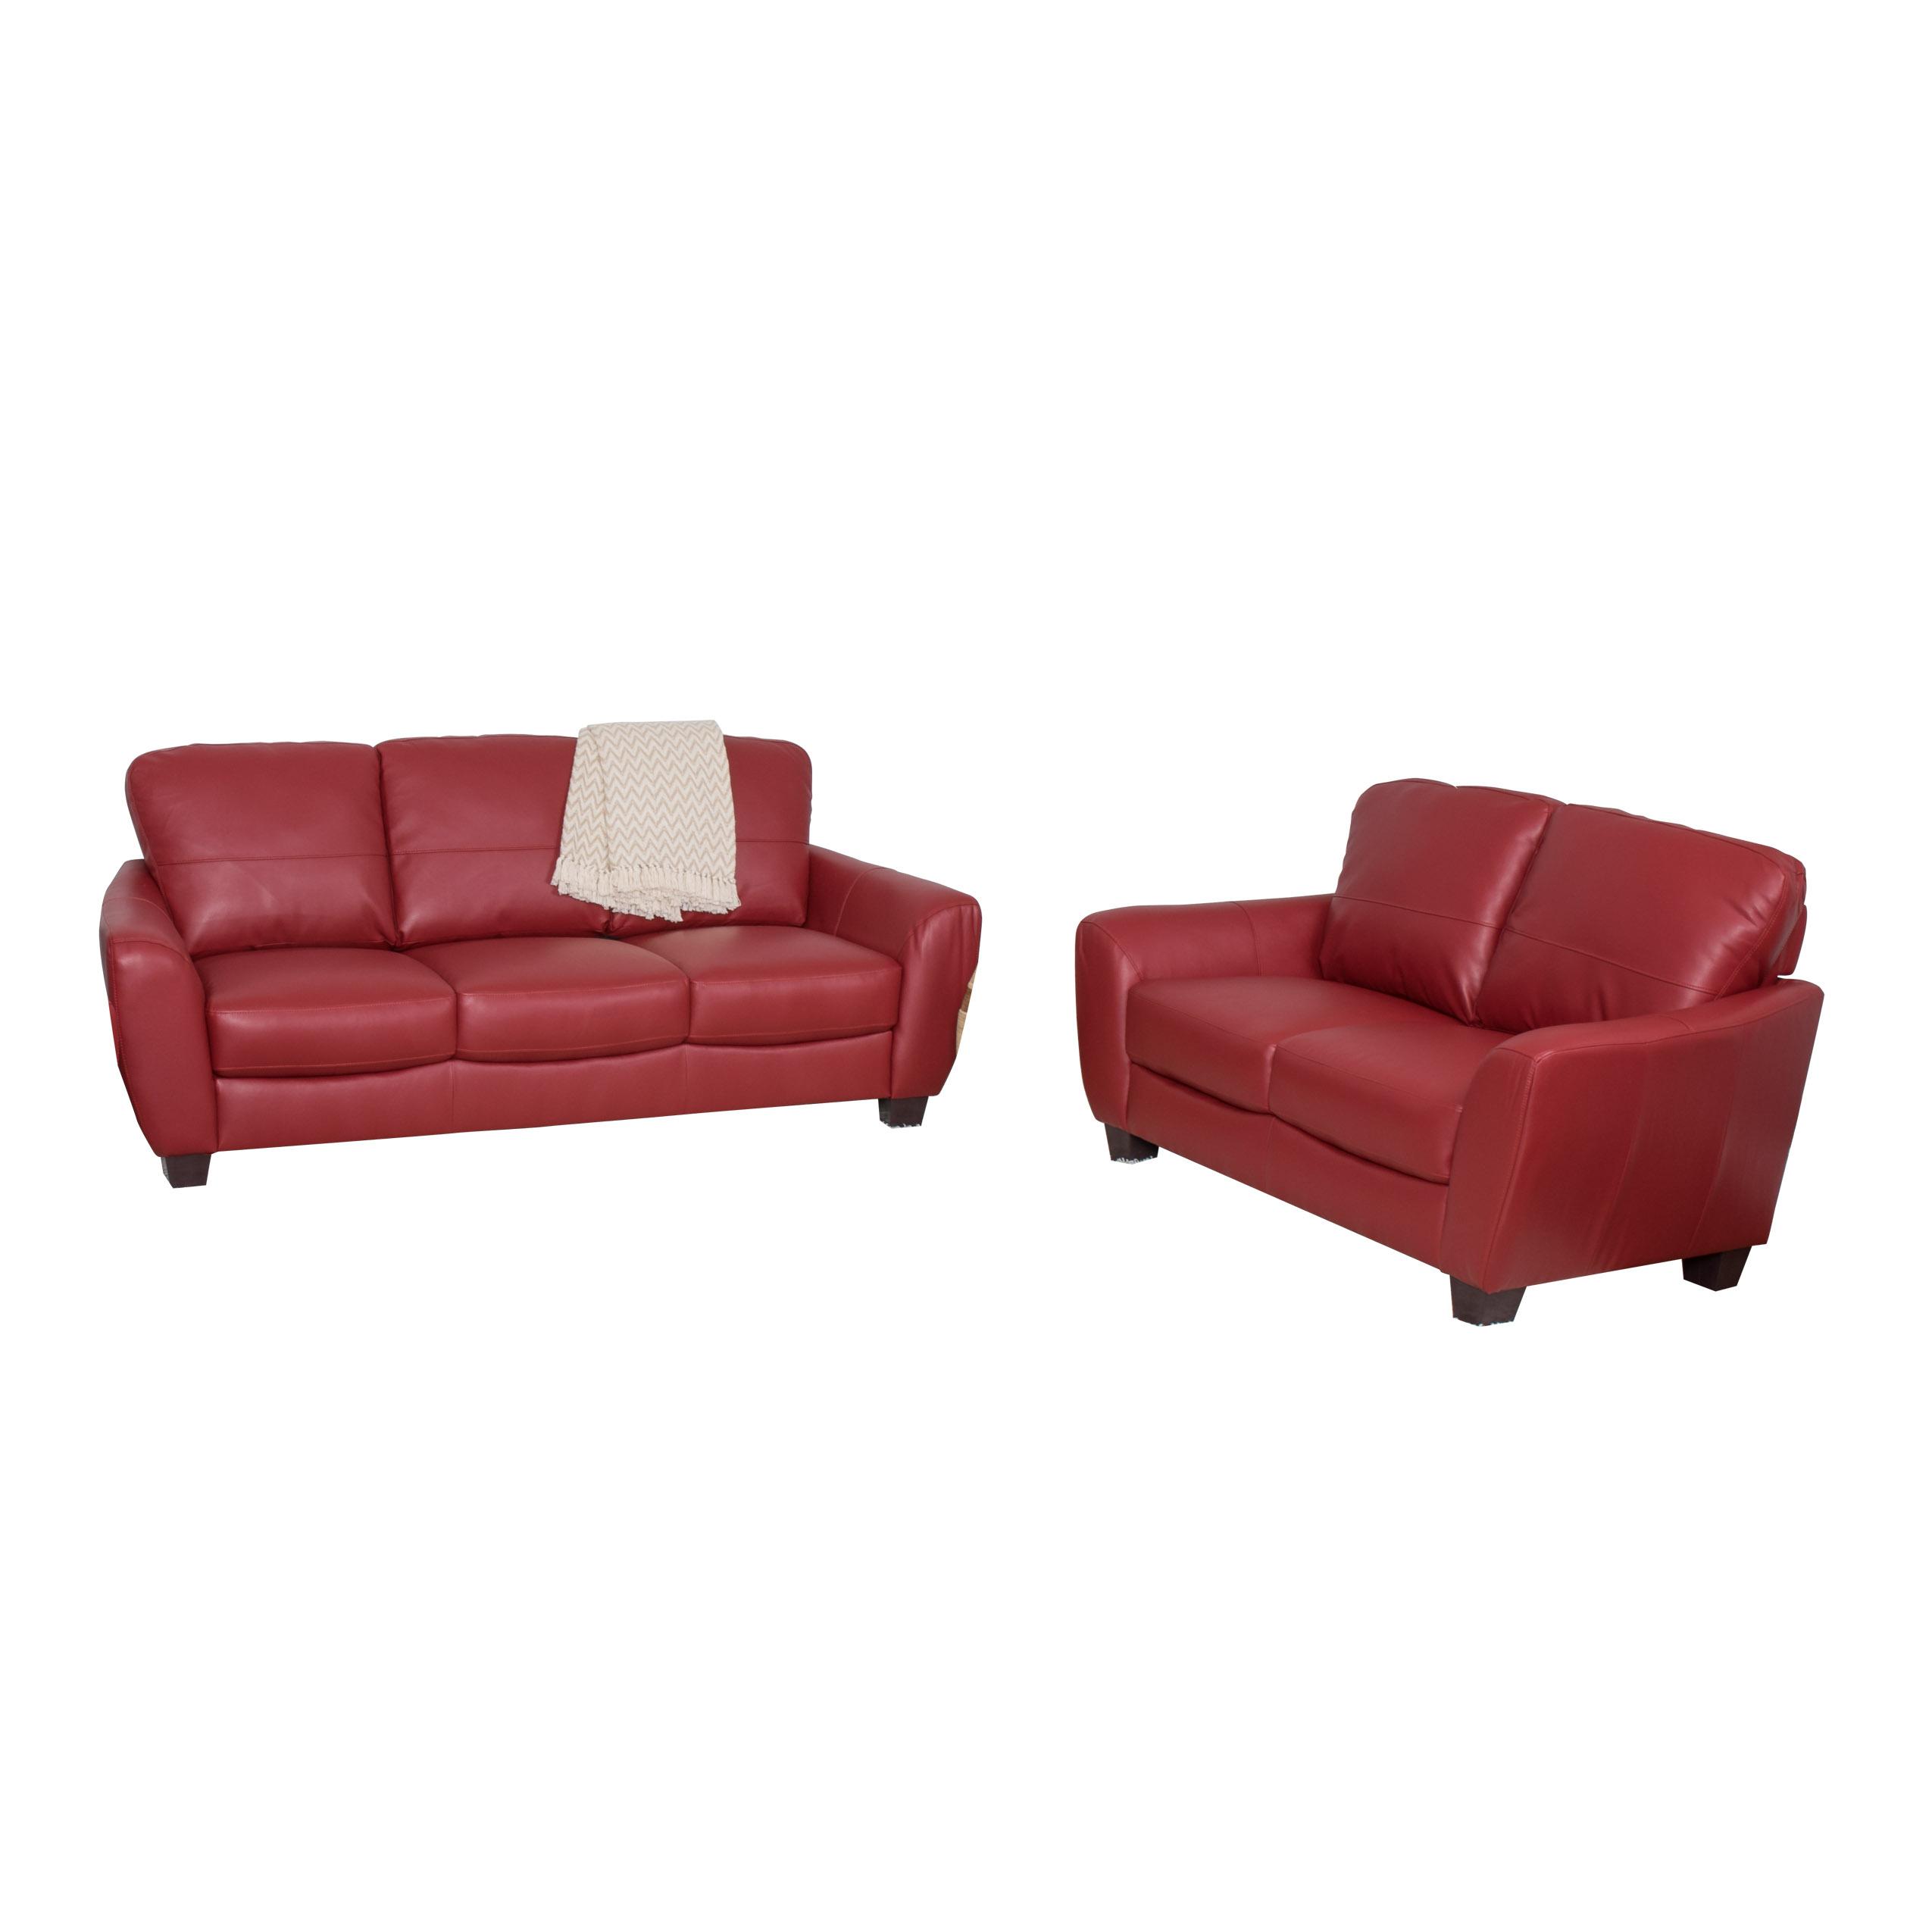 set of leather sofas rattan corner sofa with storage box 2pc red bonded arlene s interiors